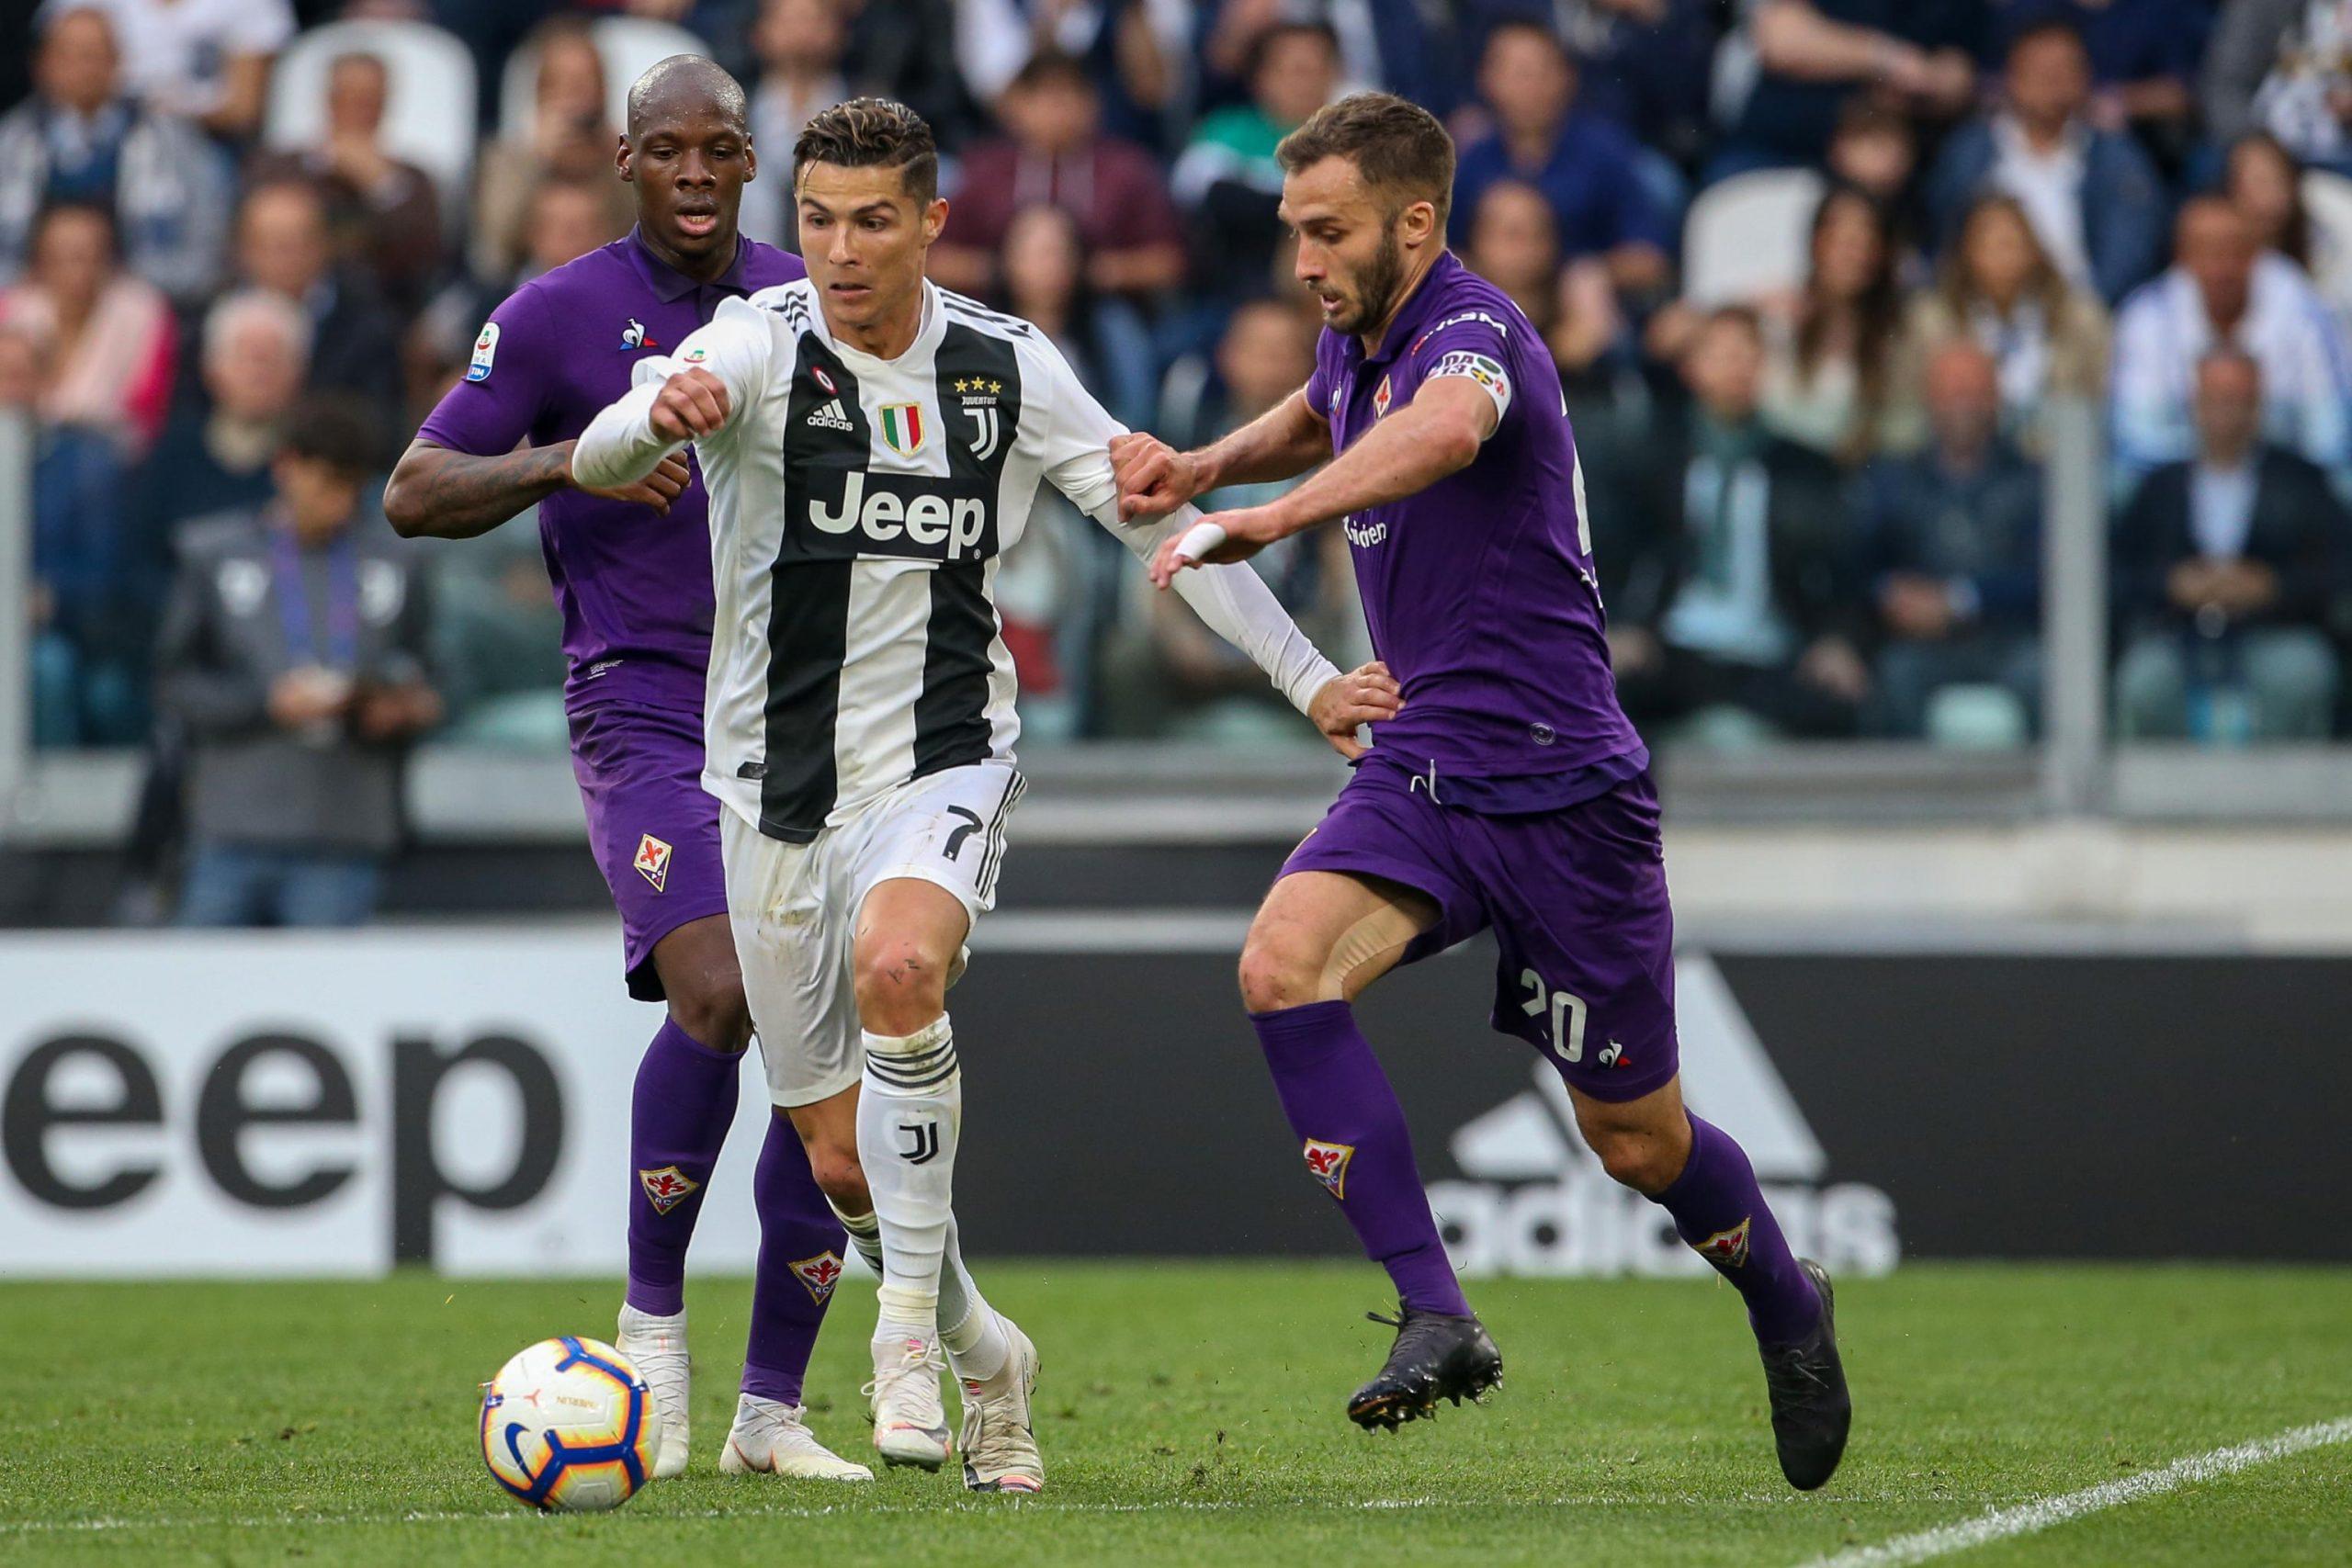 Soi kèo Fiorentina vs Juventus, 20h00 ngày 25/04 – Serie A